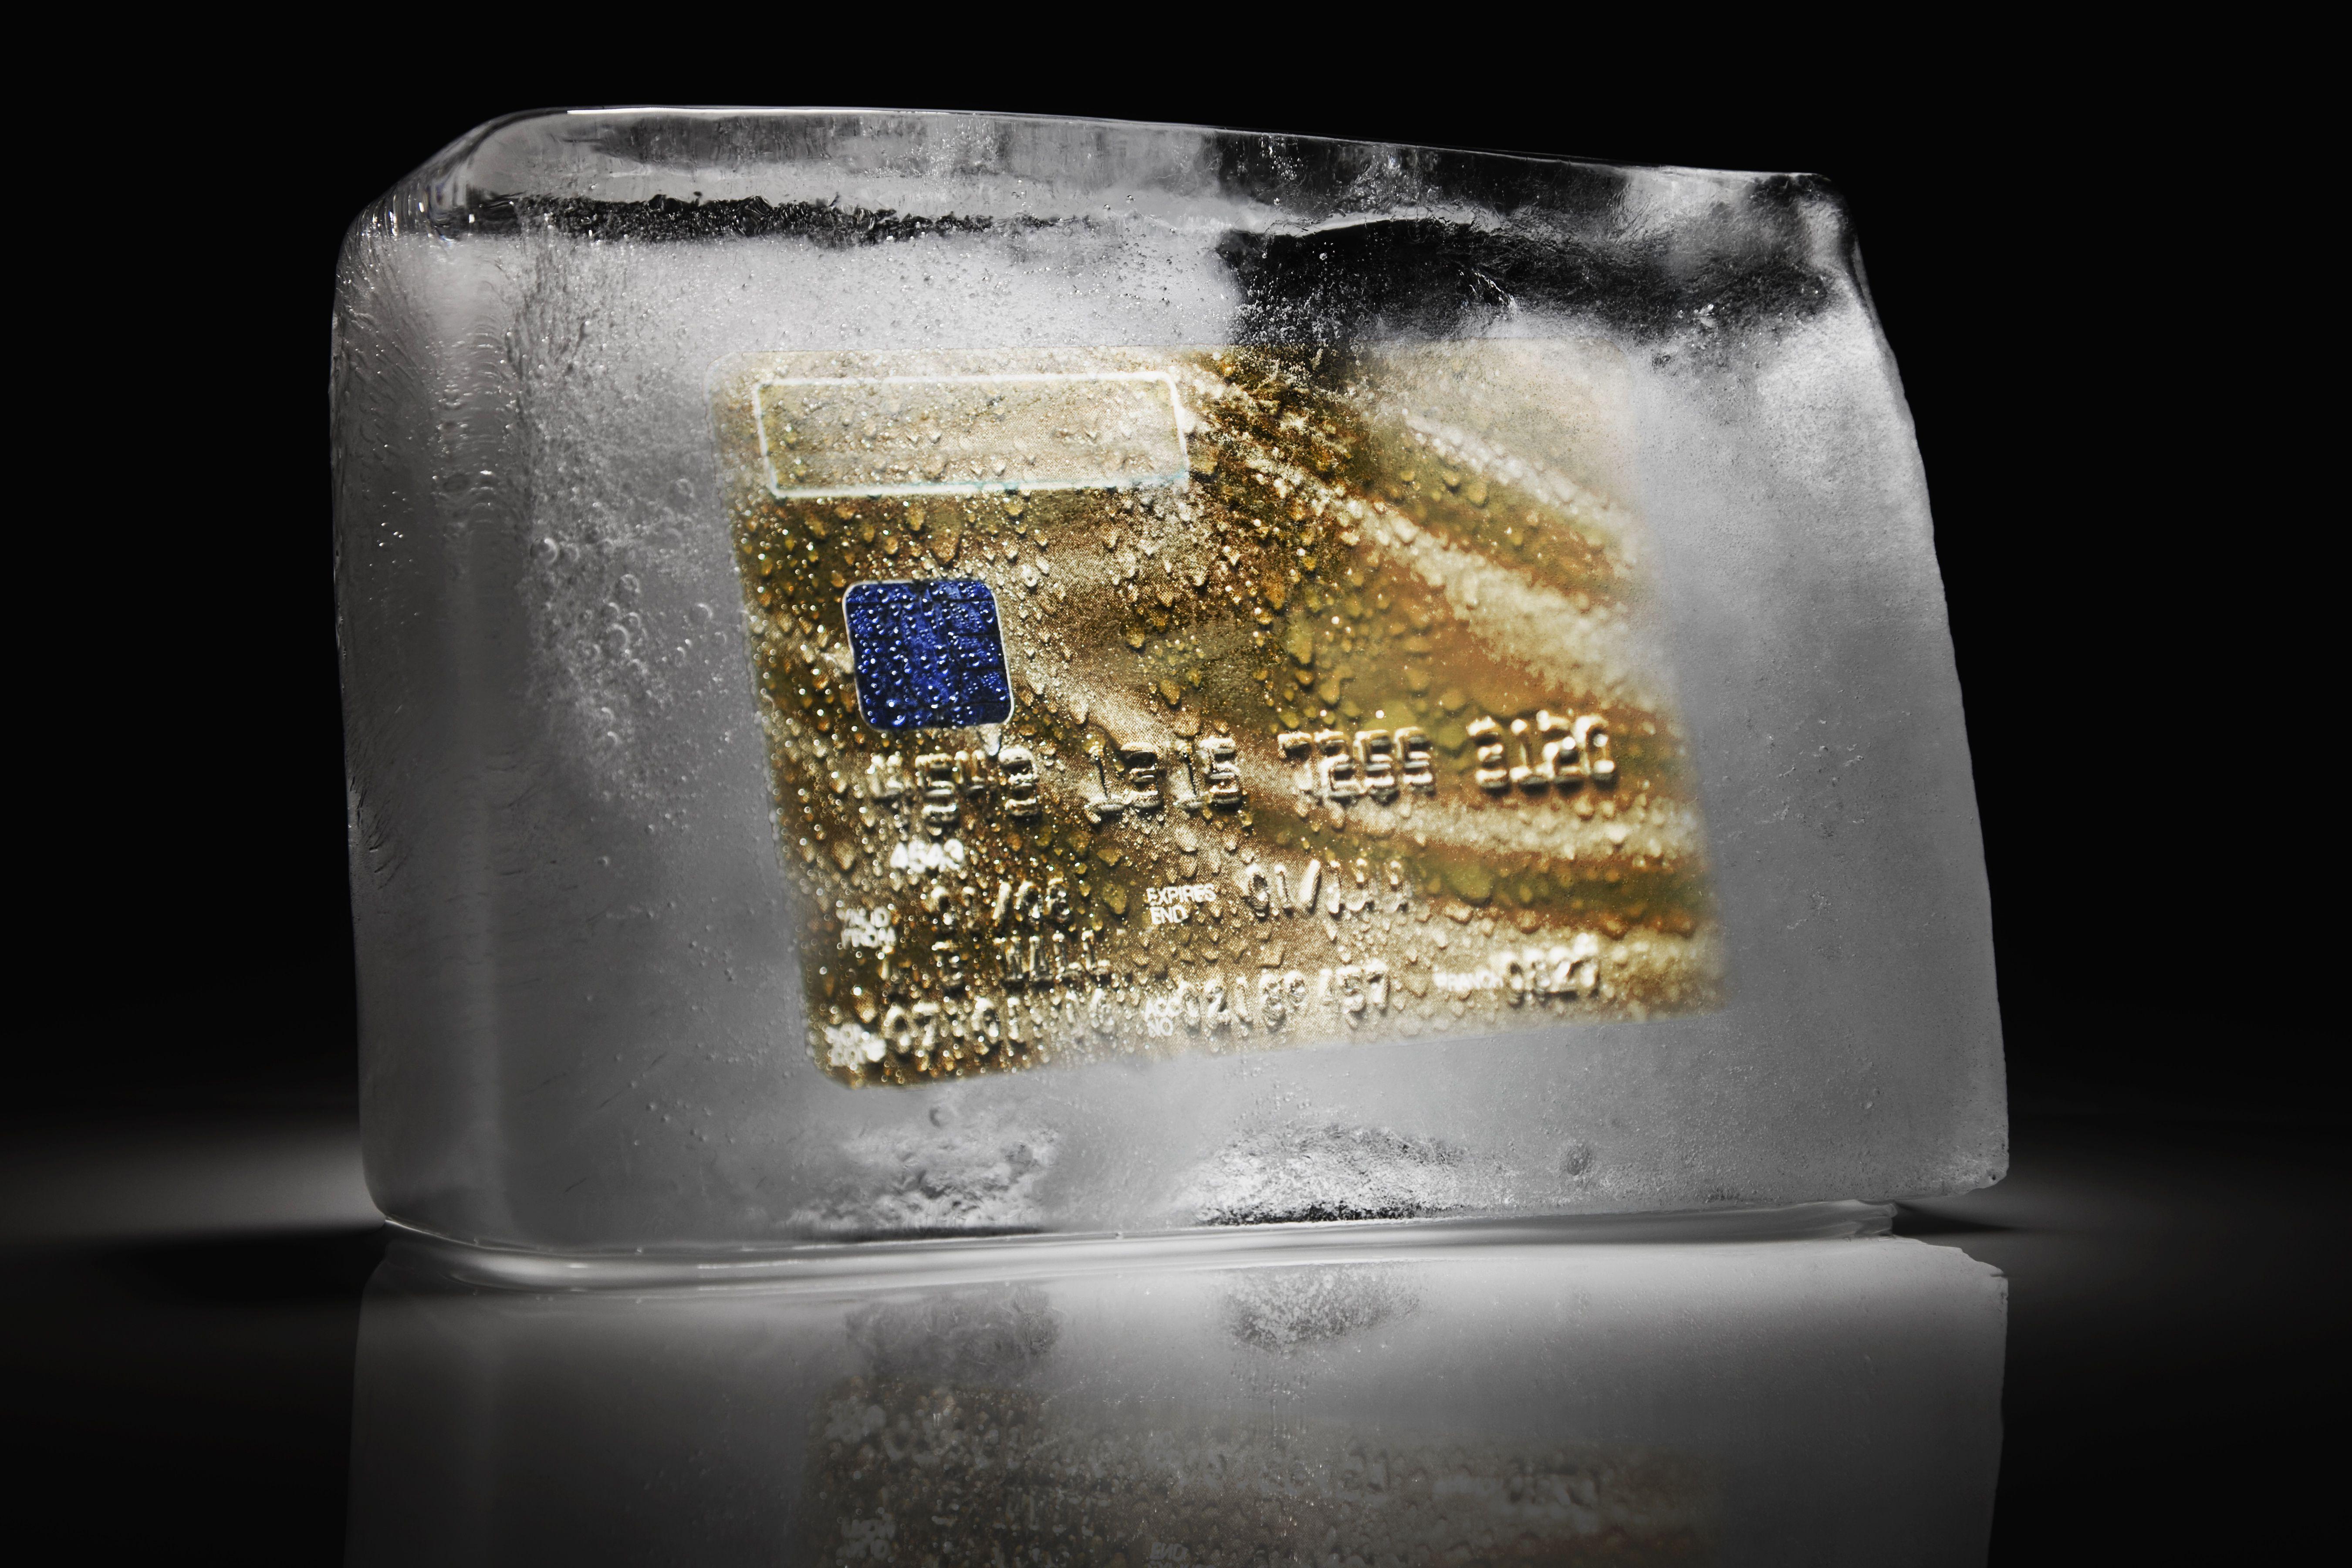 Inactive Credit Cards May Be Closed